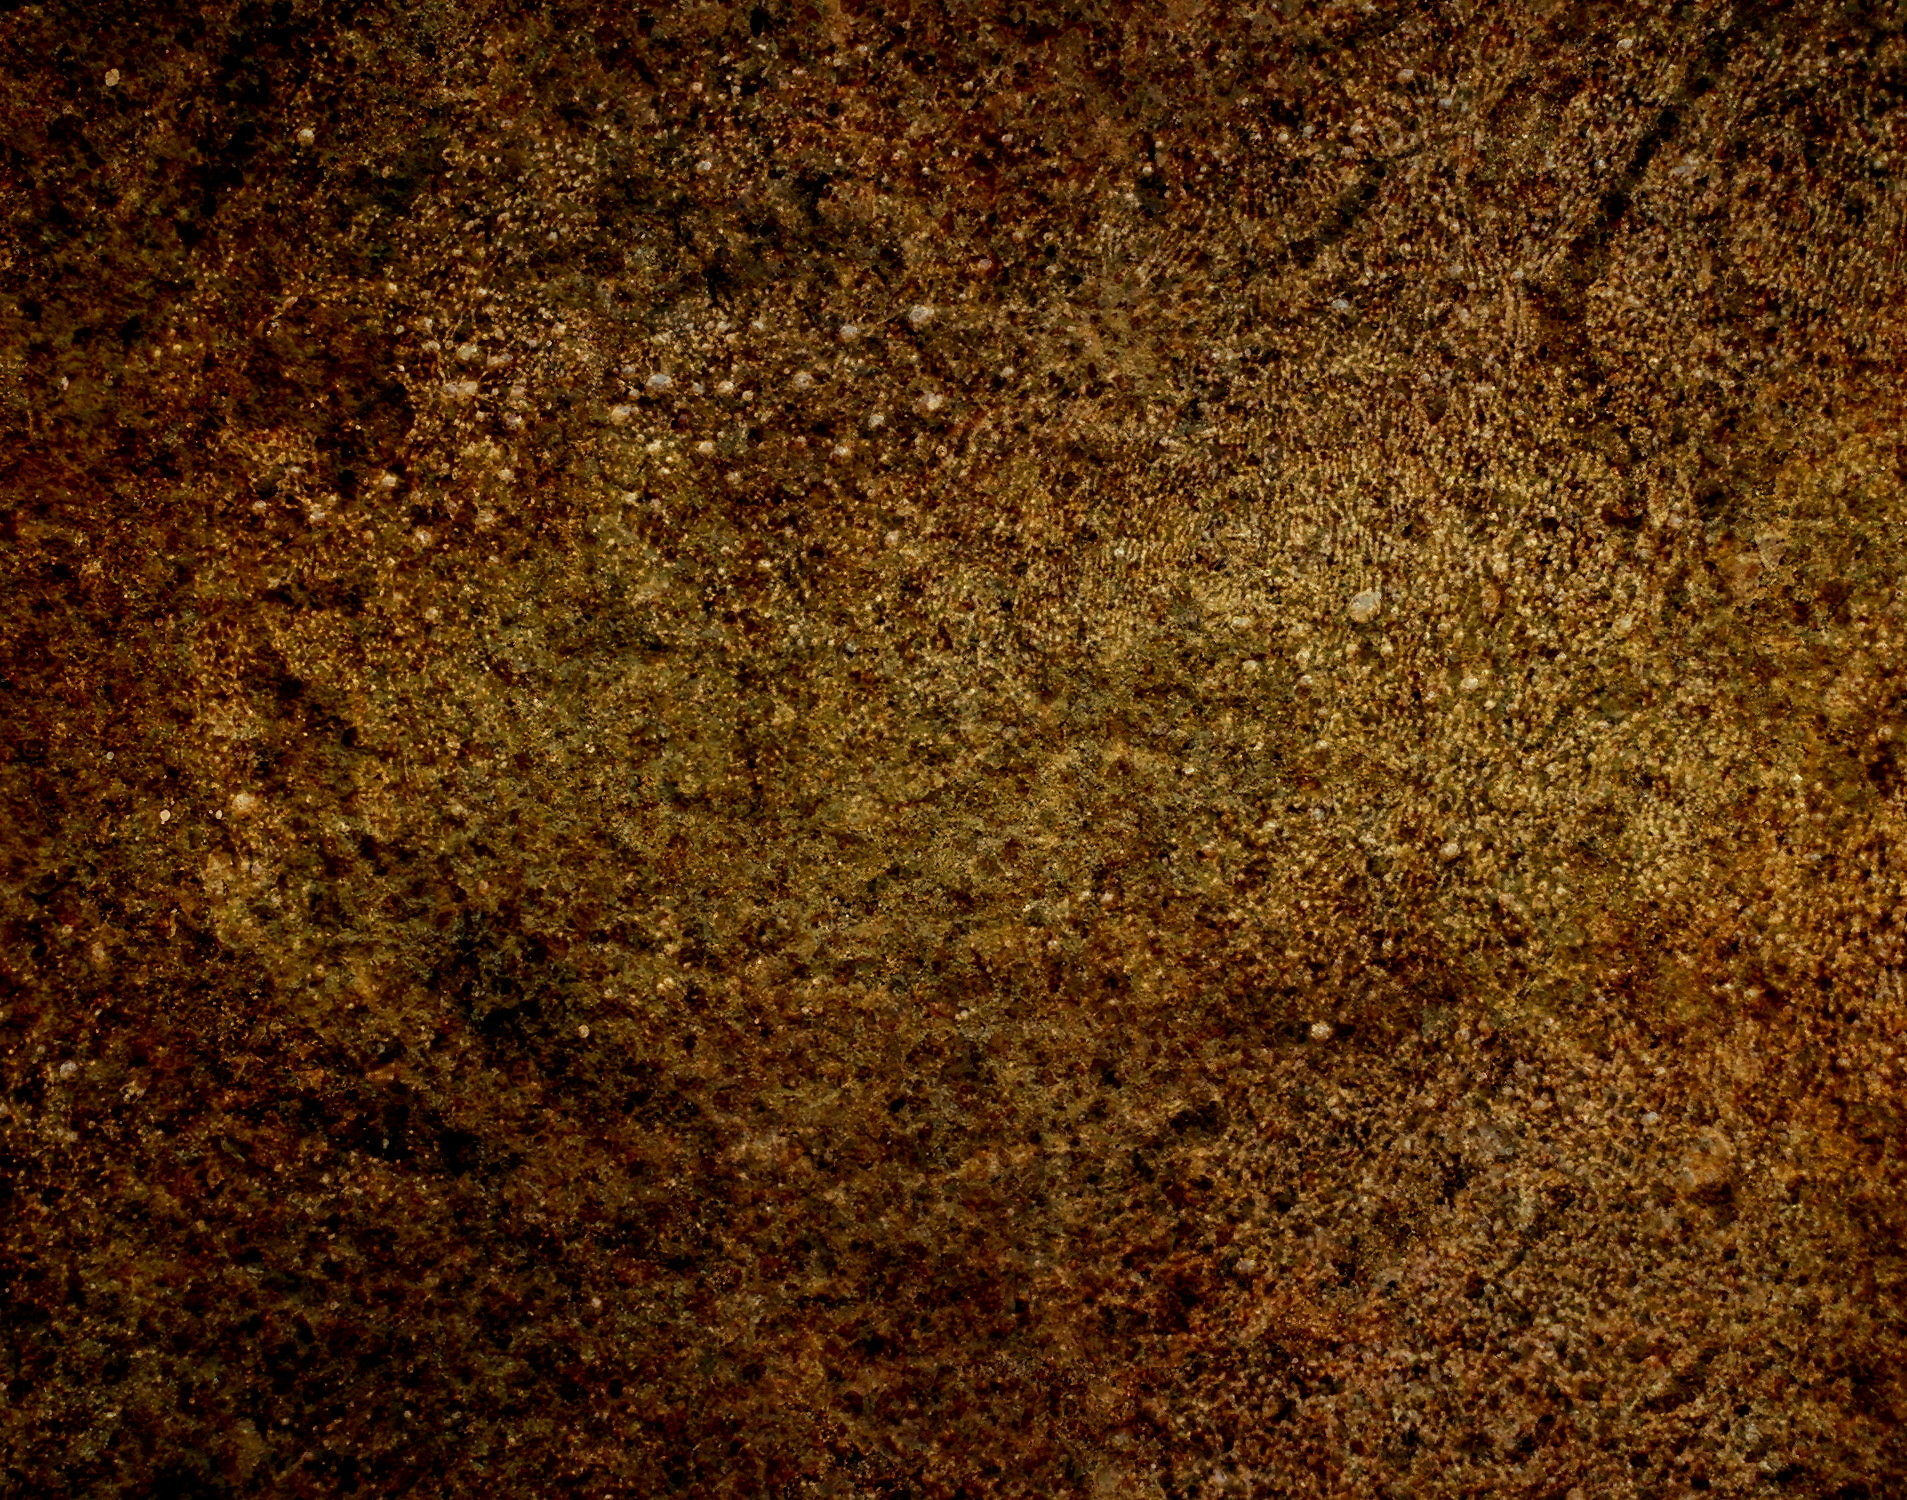 antique texture 32 by inthename stock resources stock images textures ...: inthename-stock.deviantart.com/art/Antique-Texture-32-72176378